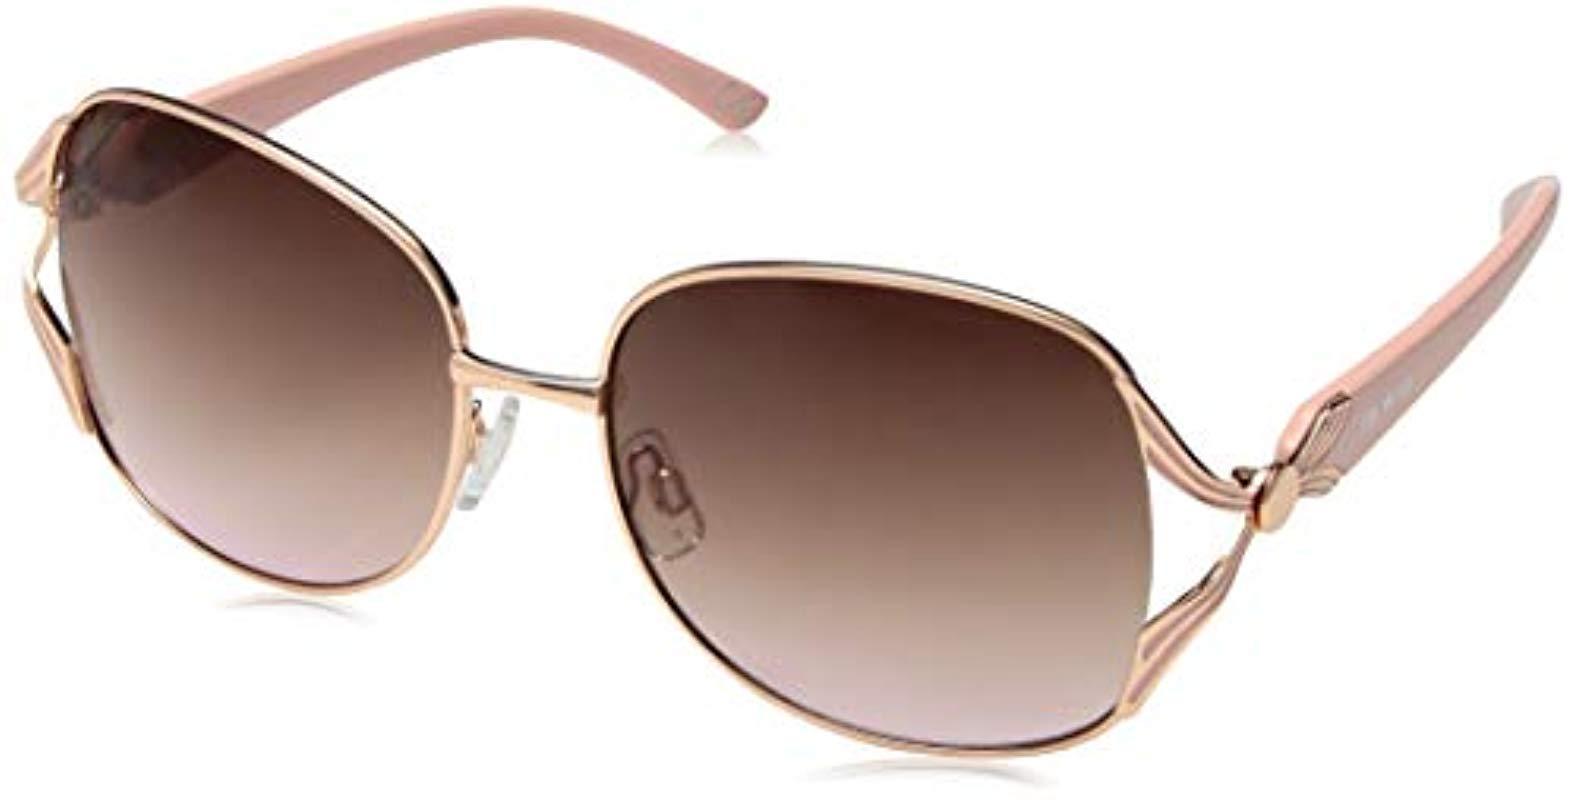 944831031ed Steve Madden. Women s Pink Sm495123 Round Sunglasses Rose Gold